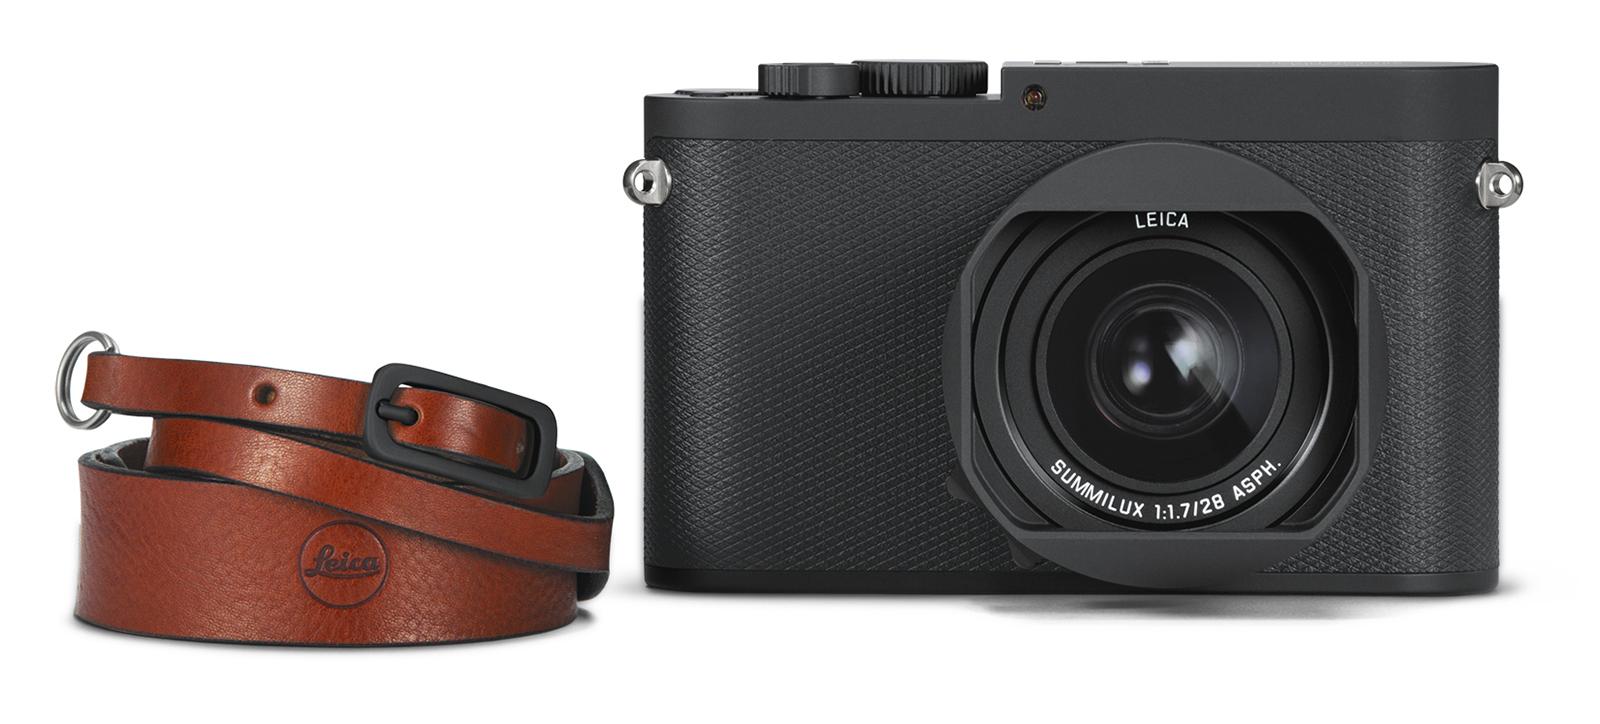 Leica Q-P_carrying strap_front_RGB.jpg